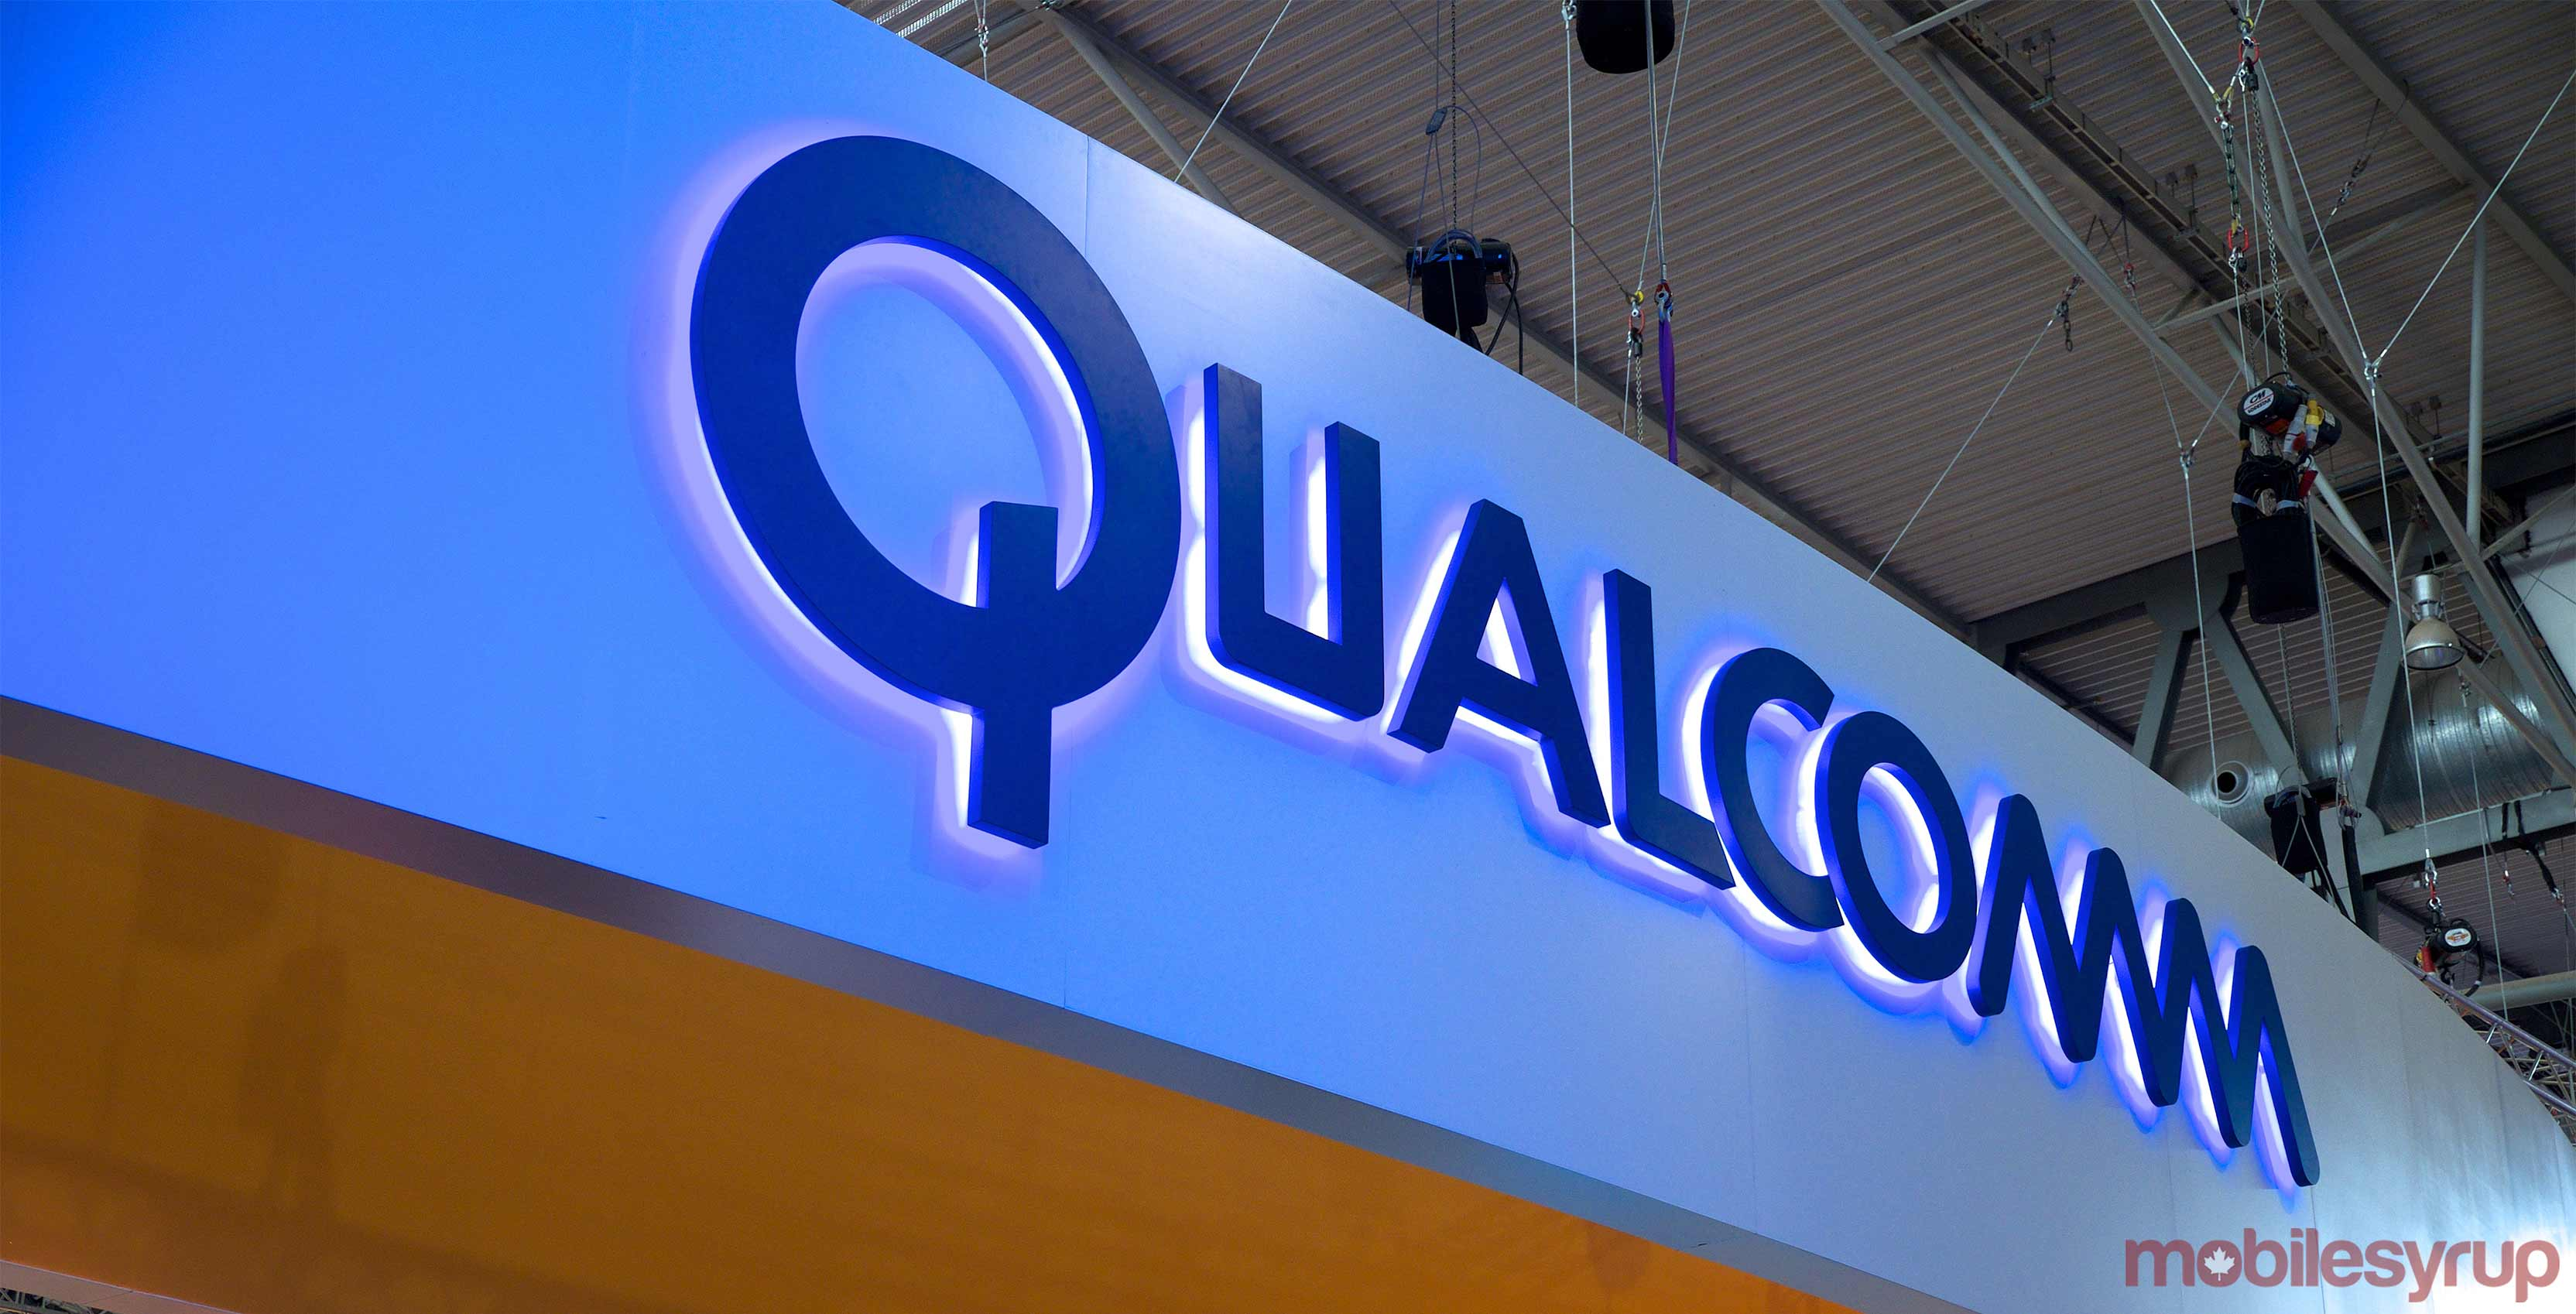 An image showcasing the Qualcomm logo